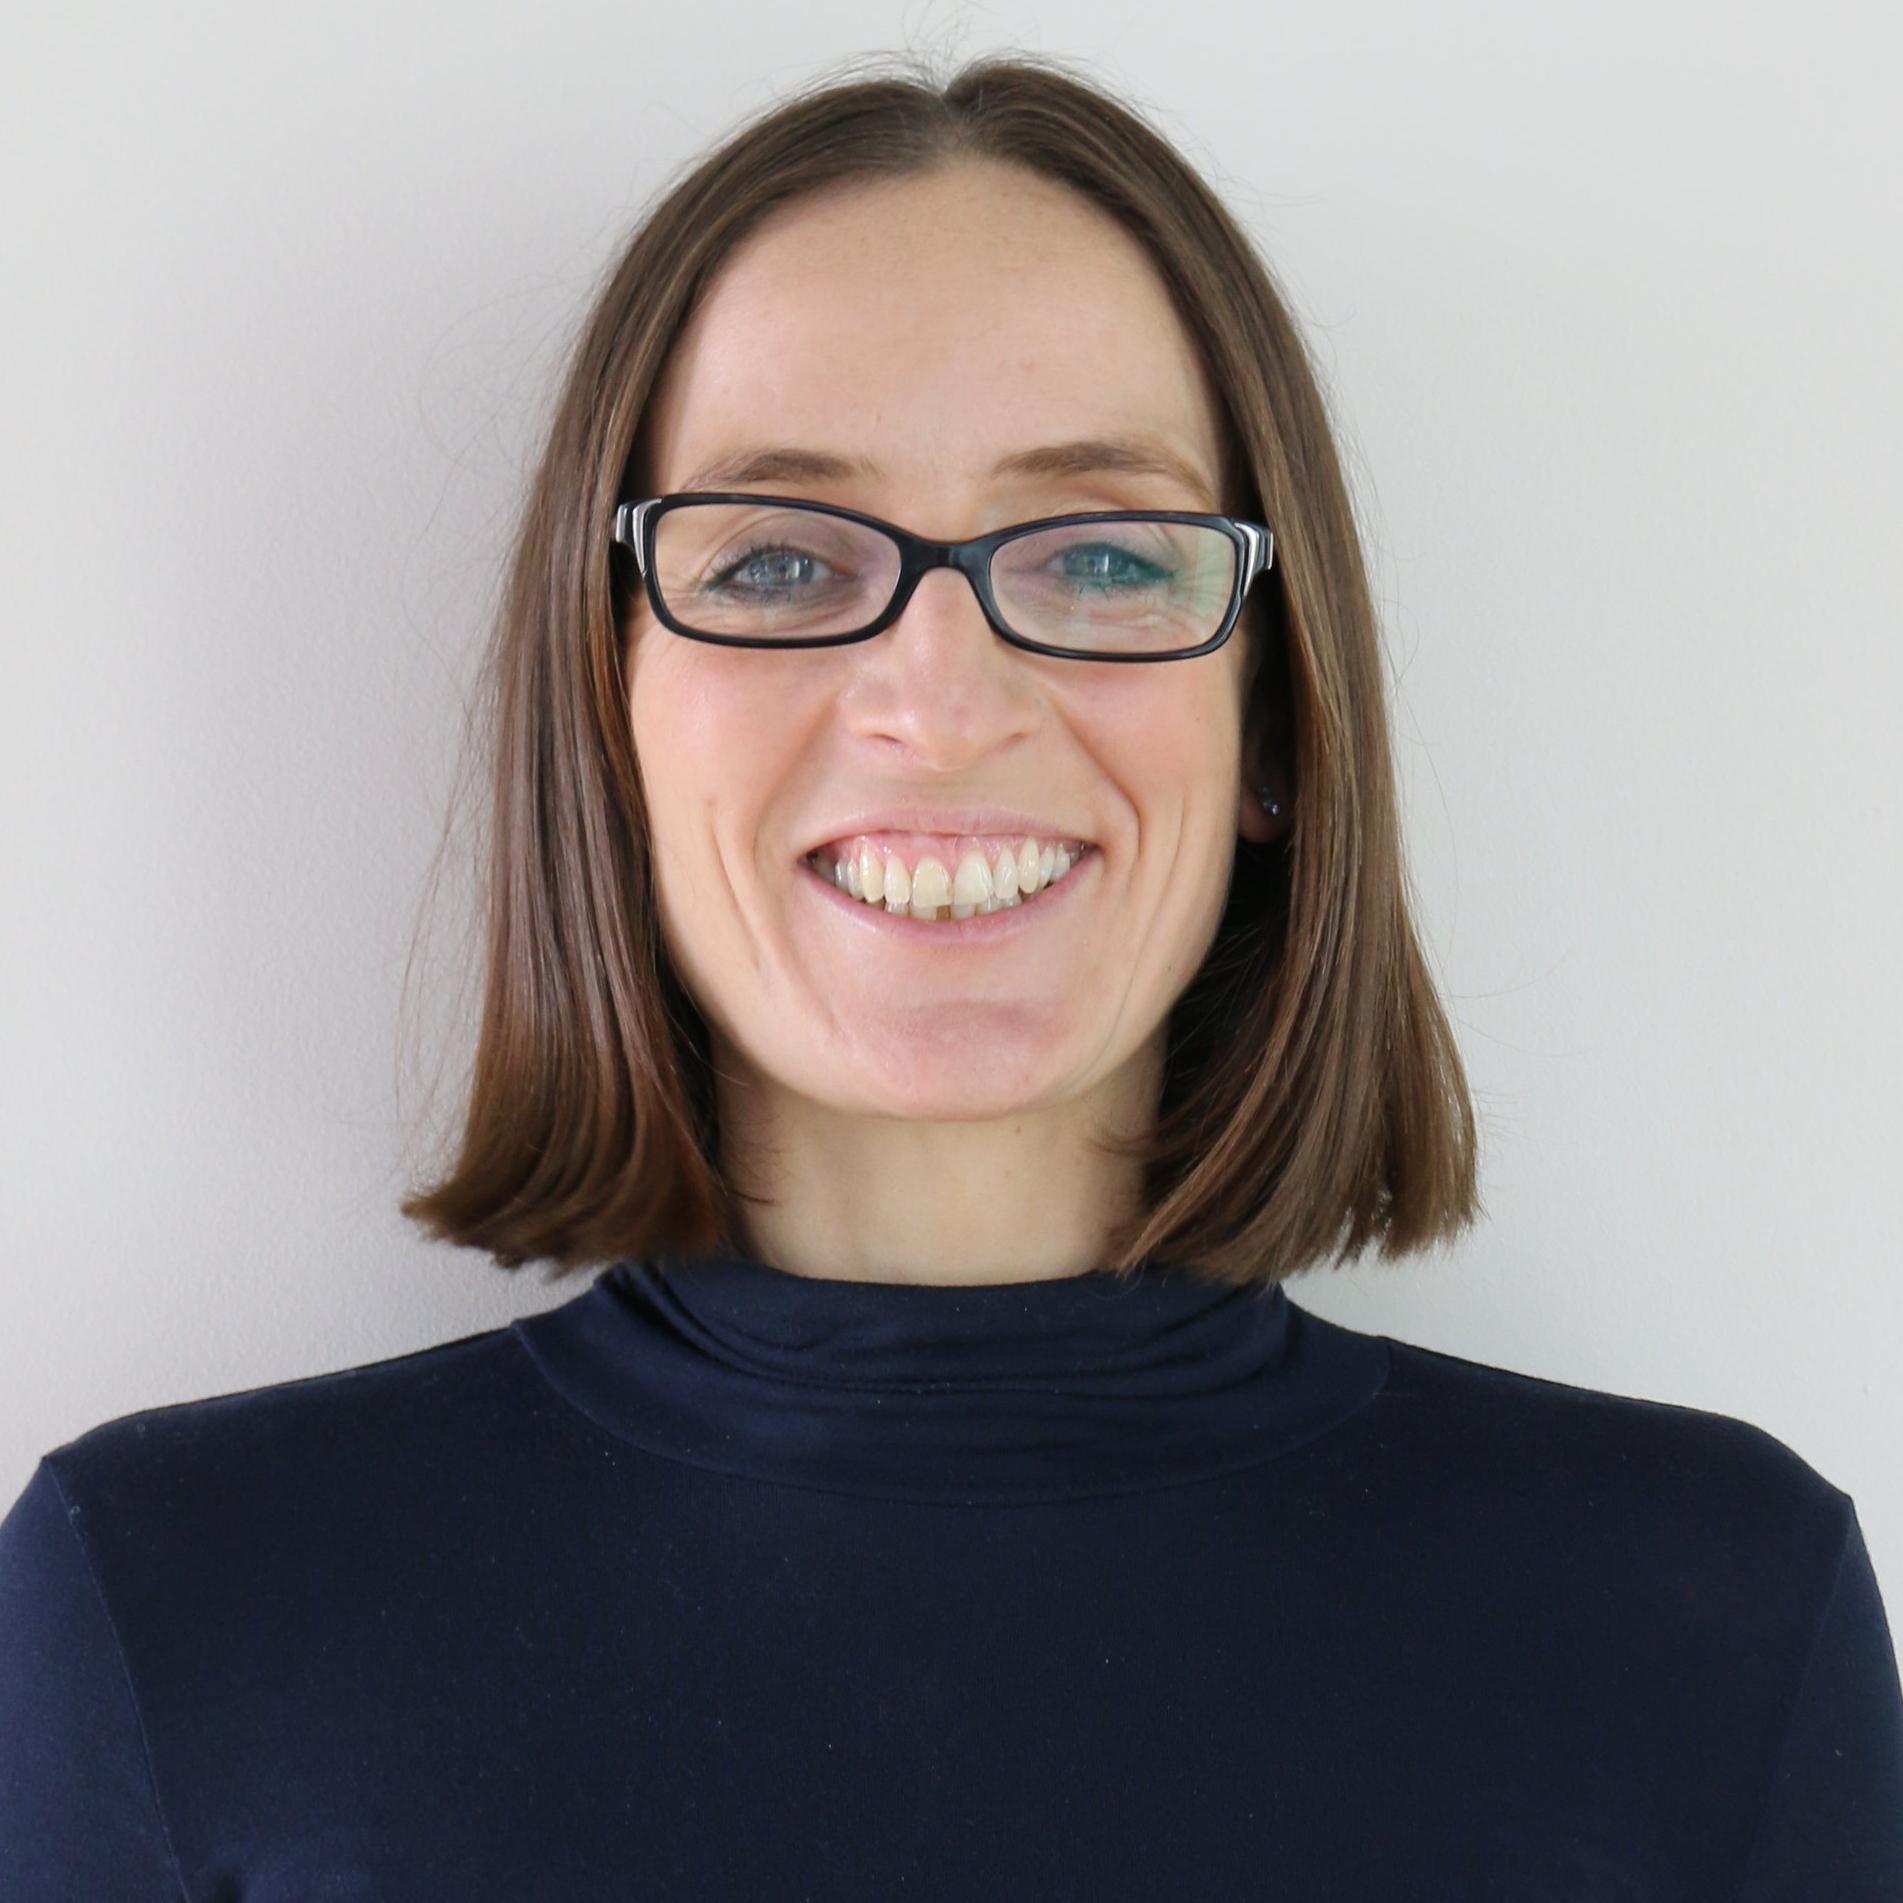 Alexandra Eavis, Co-founder and Director